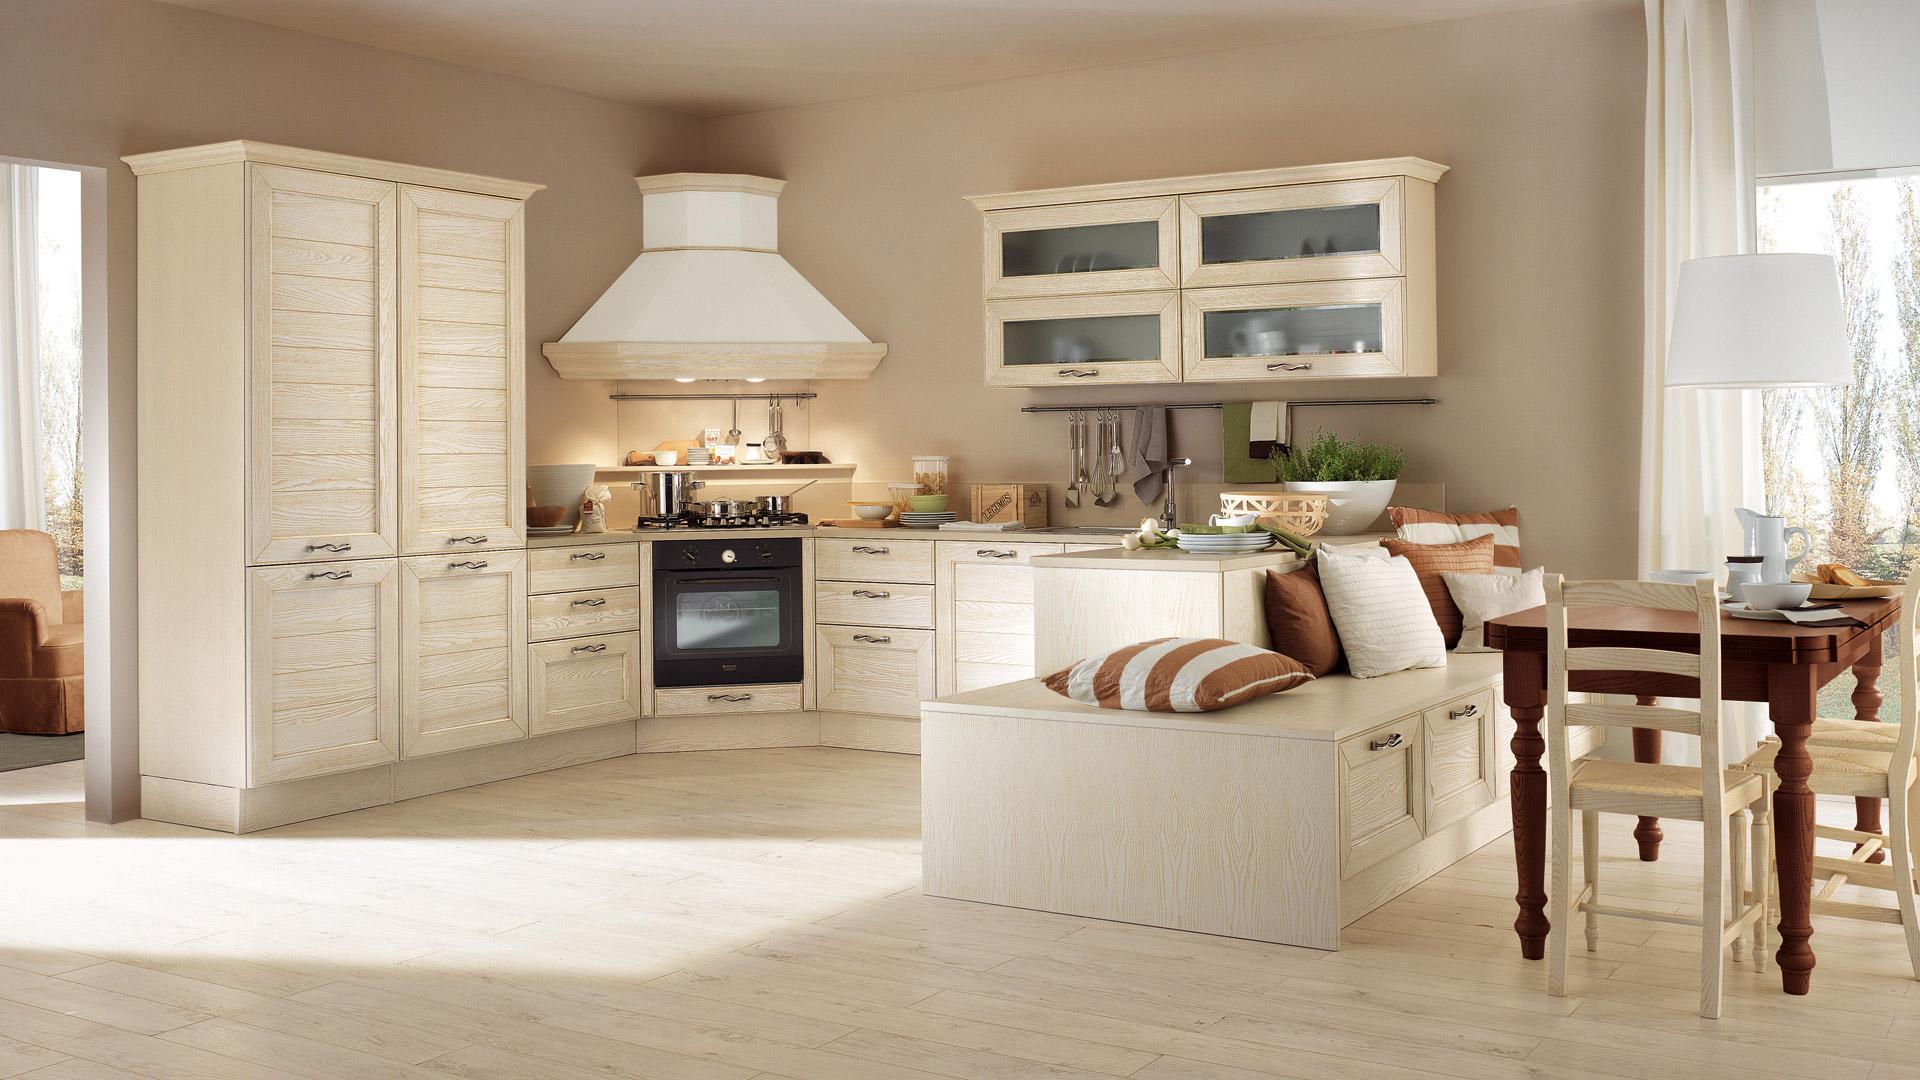 Emejing cucina lube classica pictures design ideas - Cucina classica contemporanea ...